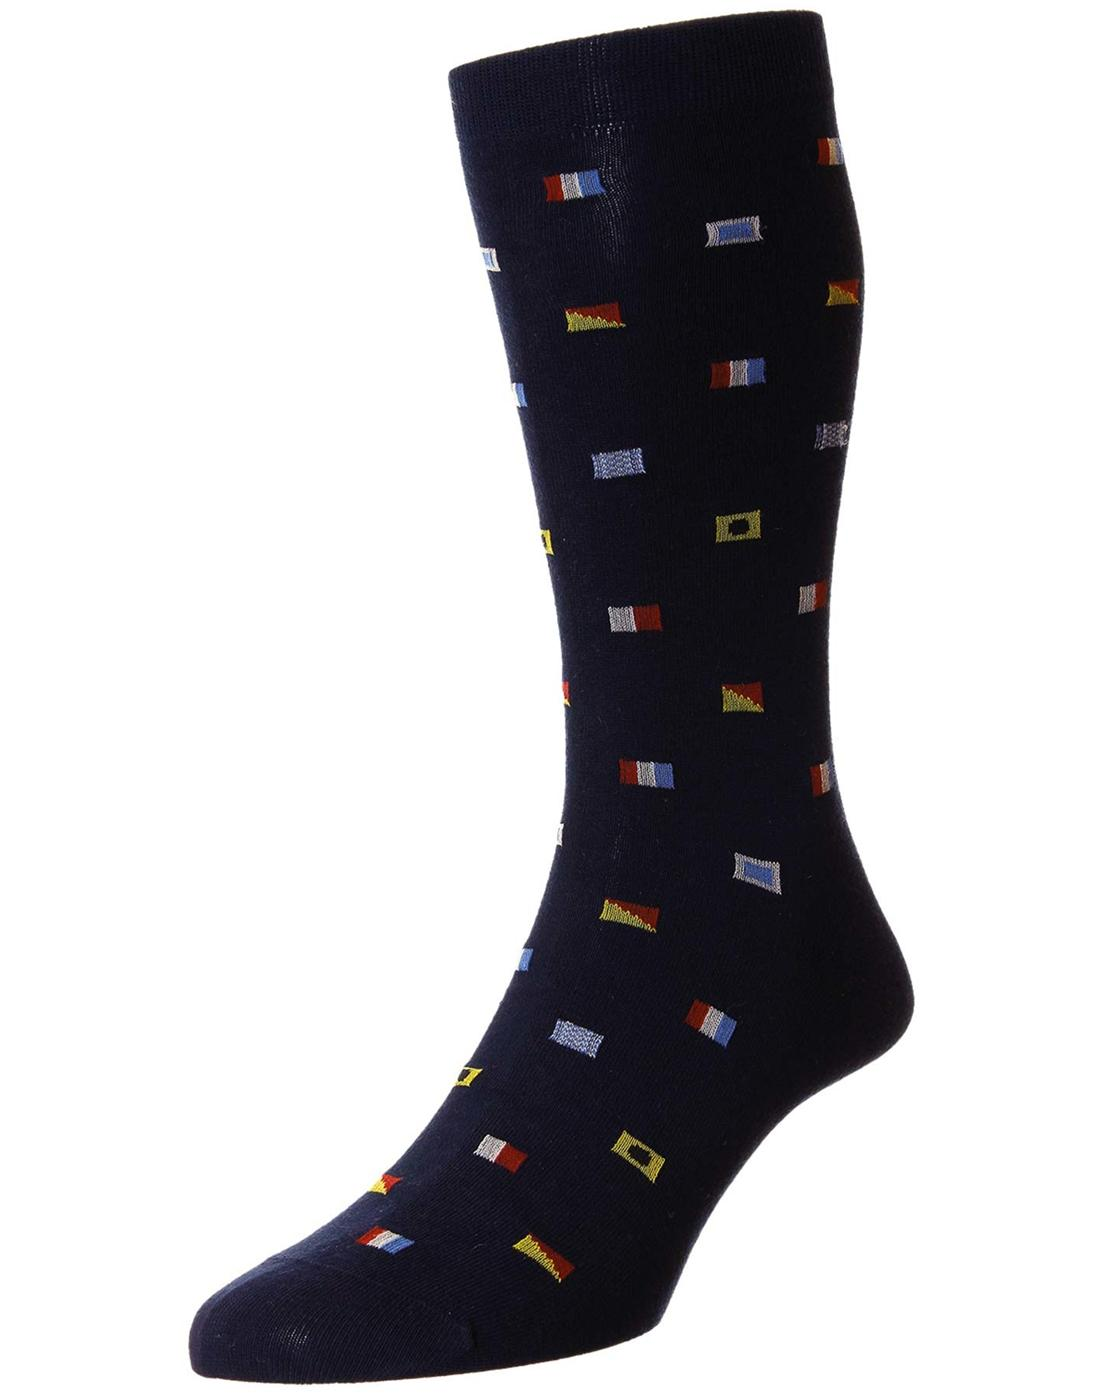 Burgee SCOTT NICHOL Retro 1970s Flag Motif Socks